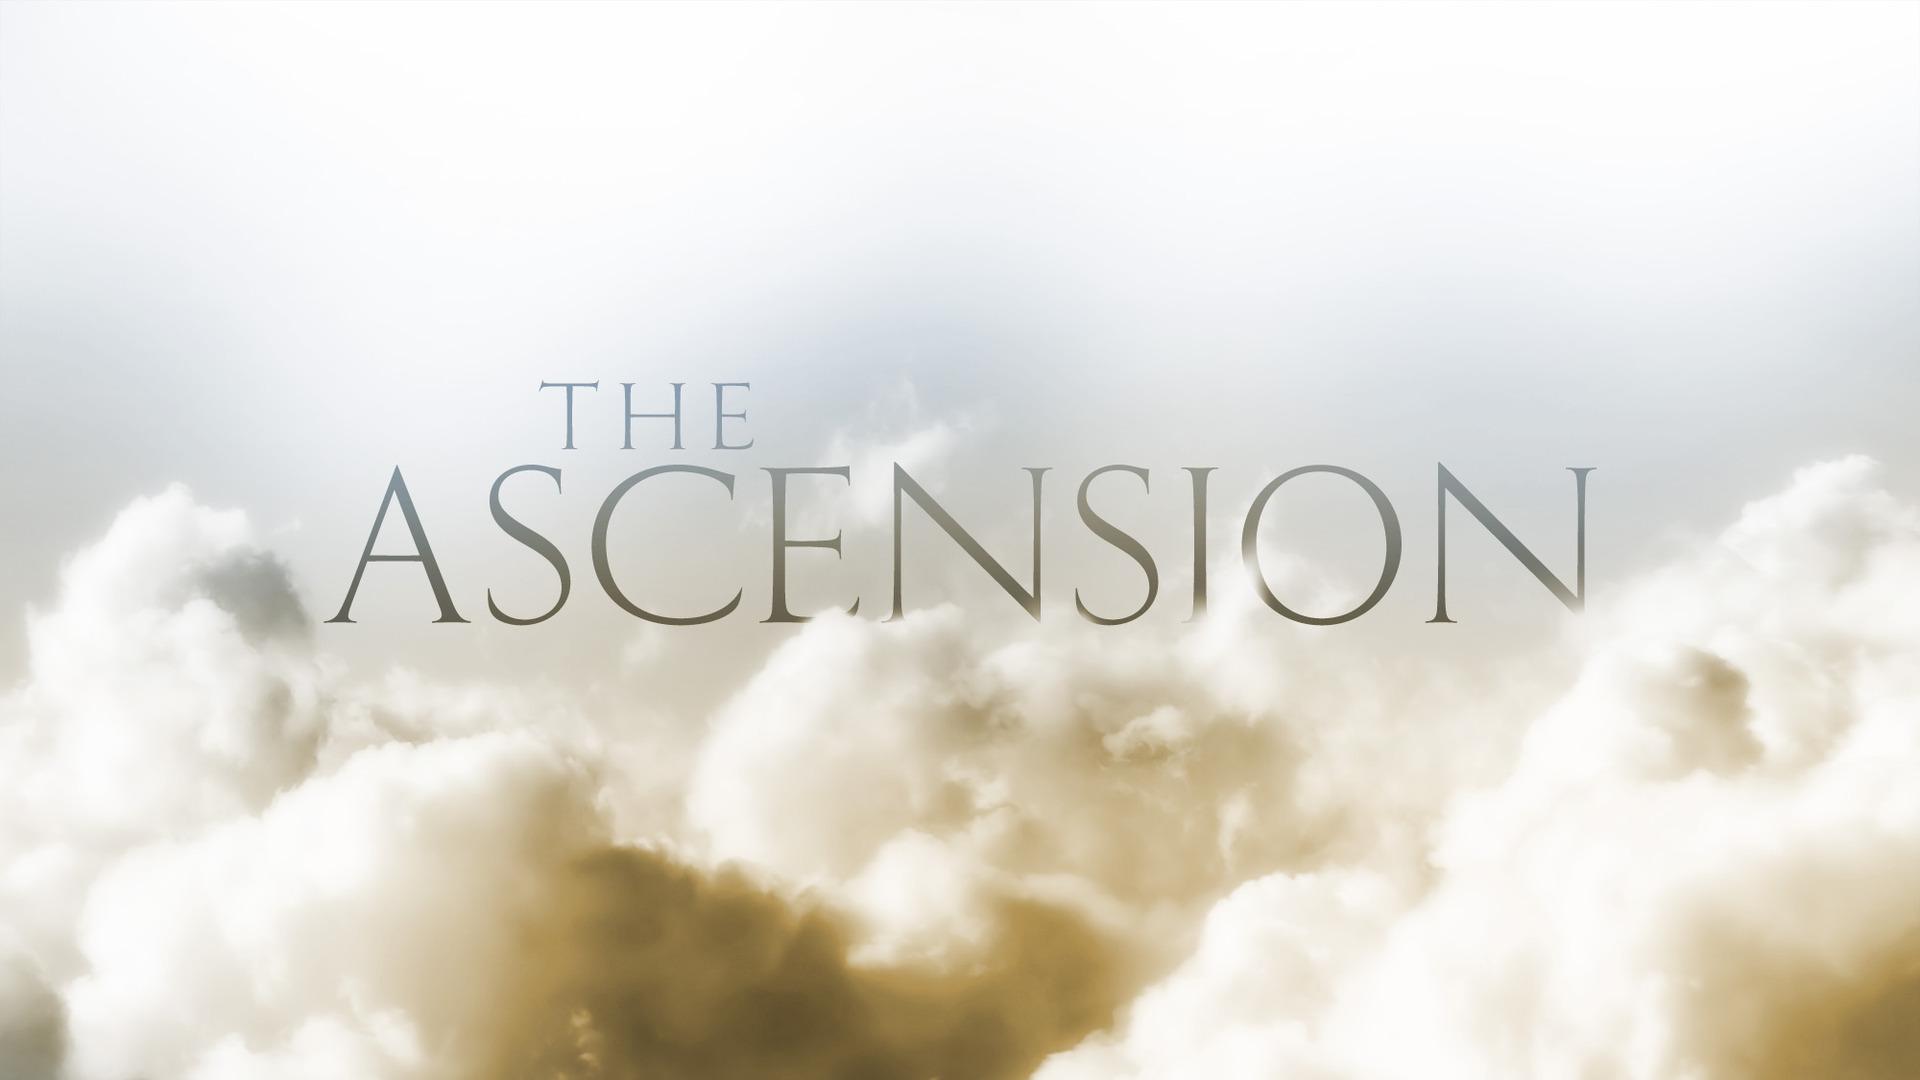 the_ascension-title-2-still-16x9.jpg